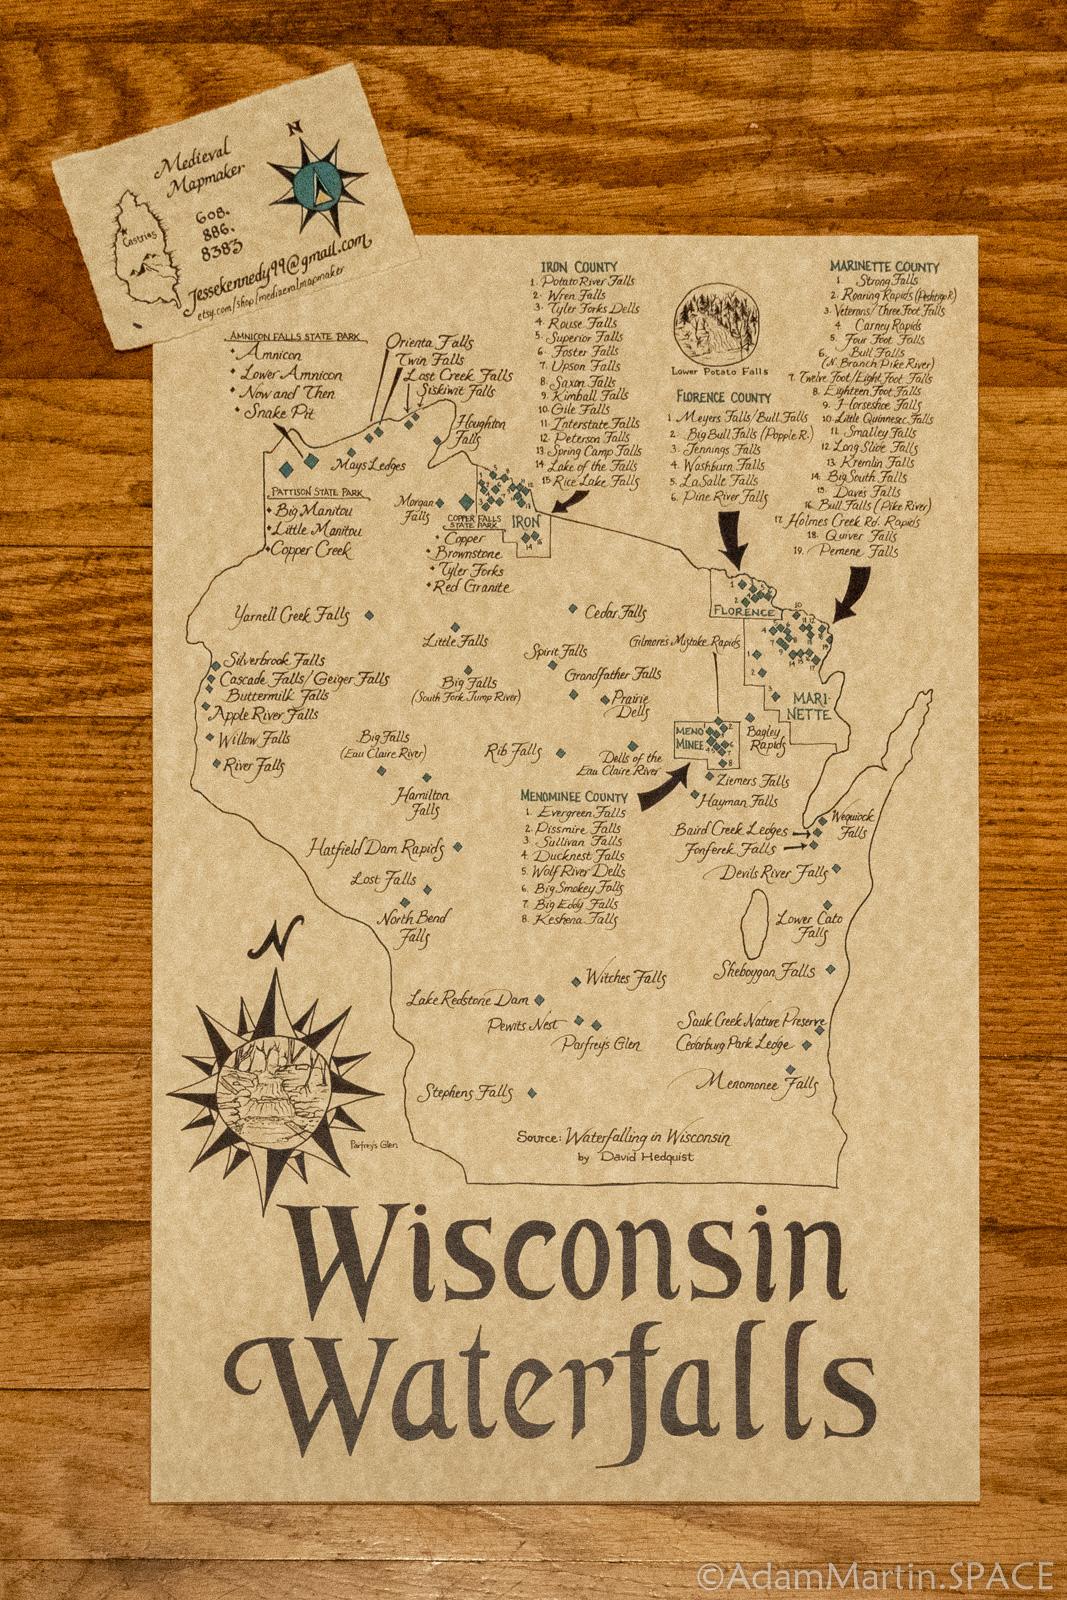 Wisconsin Waterfalls map by Jesse aka MedievalMapmaker